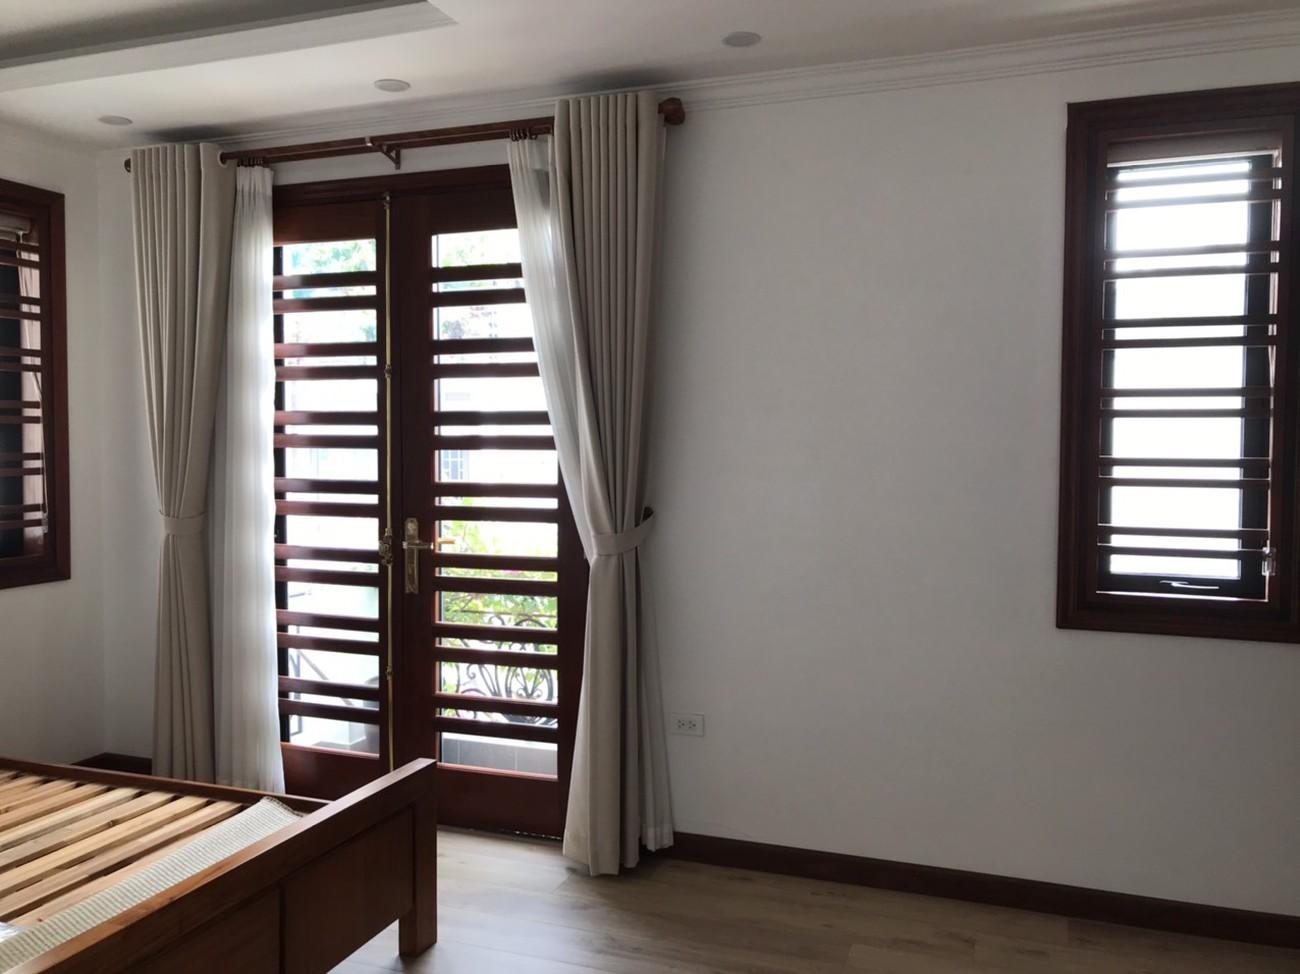 ho-mslinh-s-house-in-long-bien-hanoi-bedroomjpg-1629110279.jpg